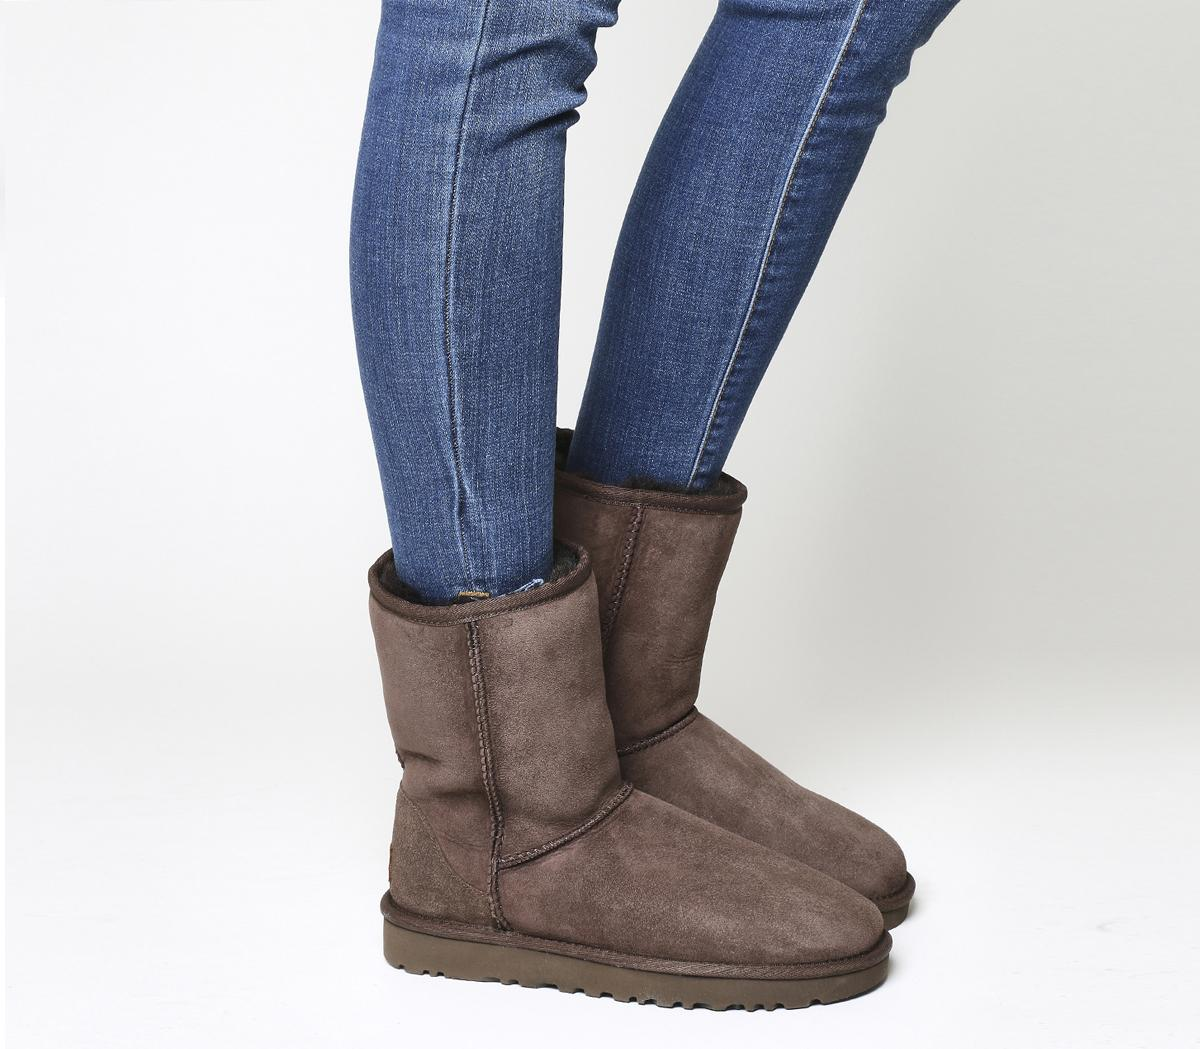 UGG Classic Short II Boots Chocolate